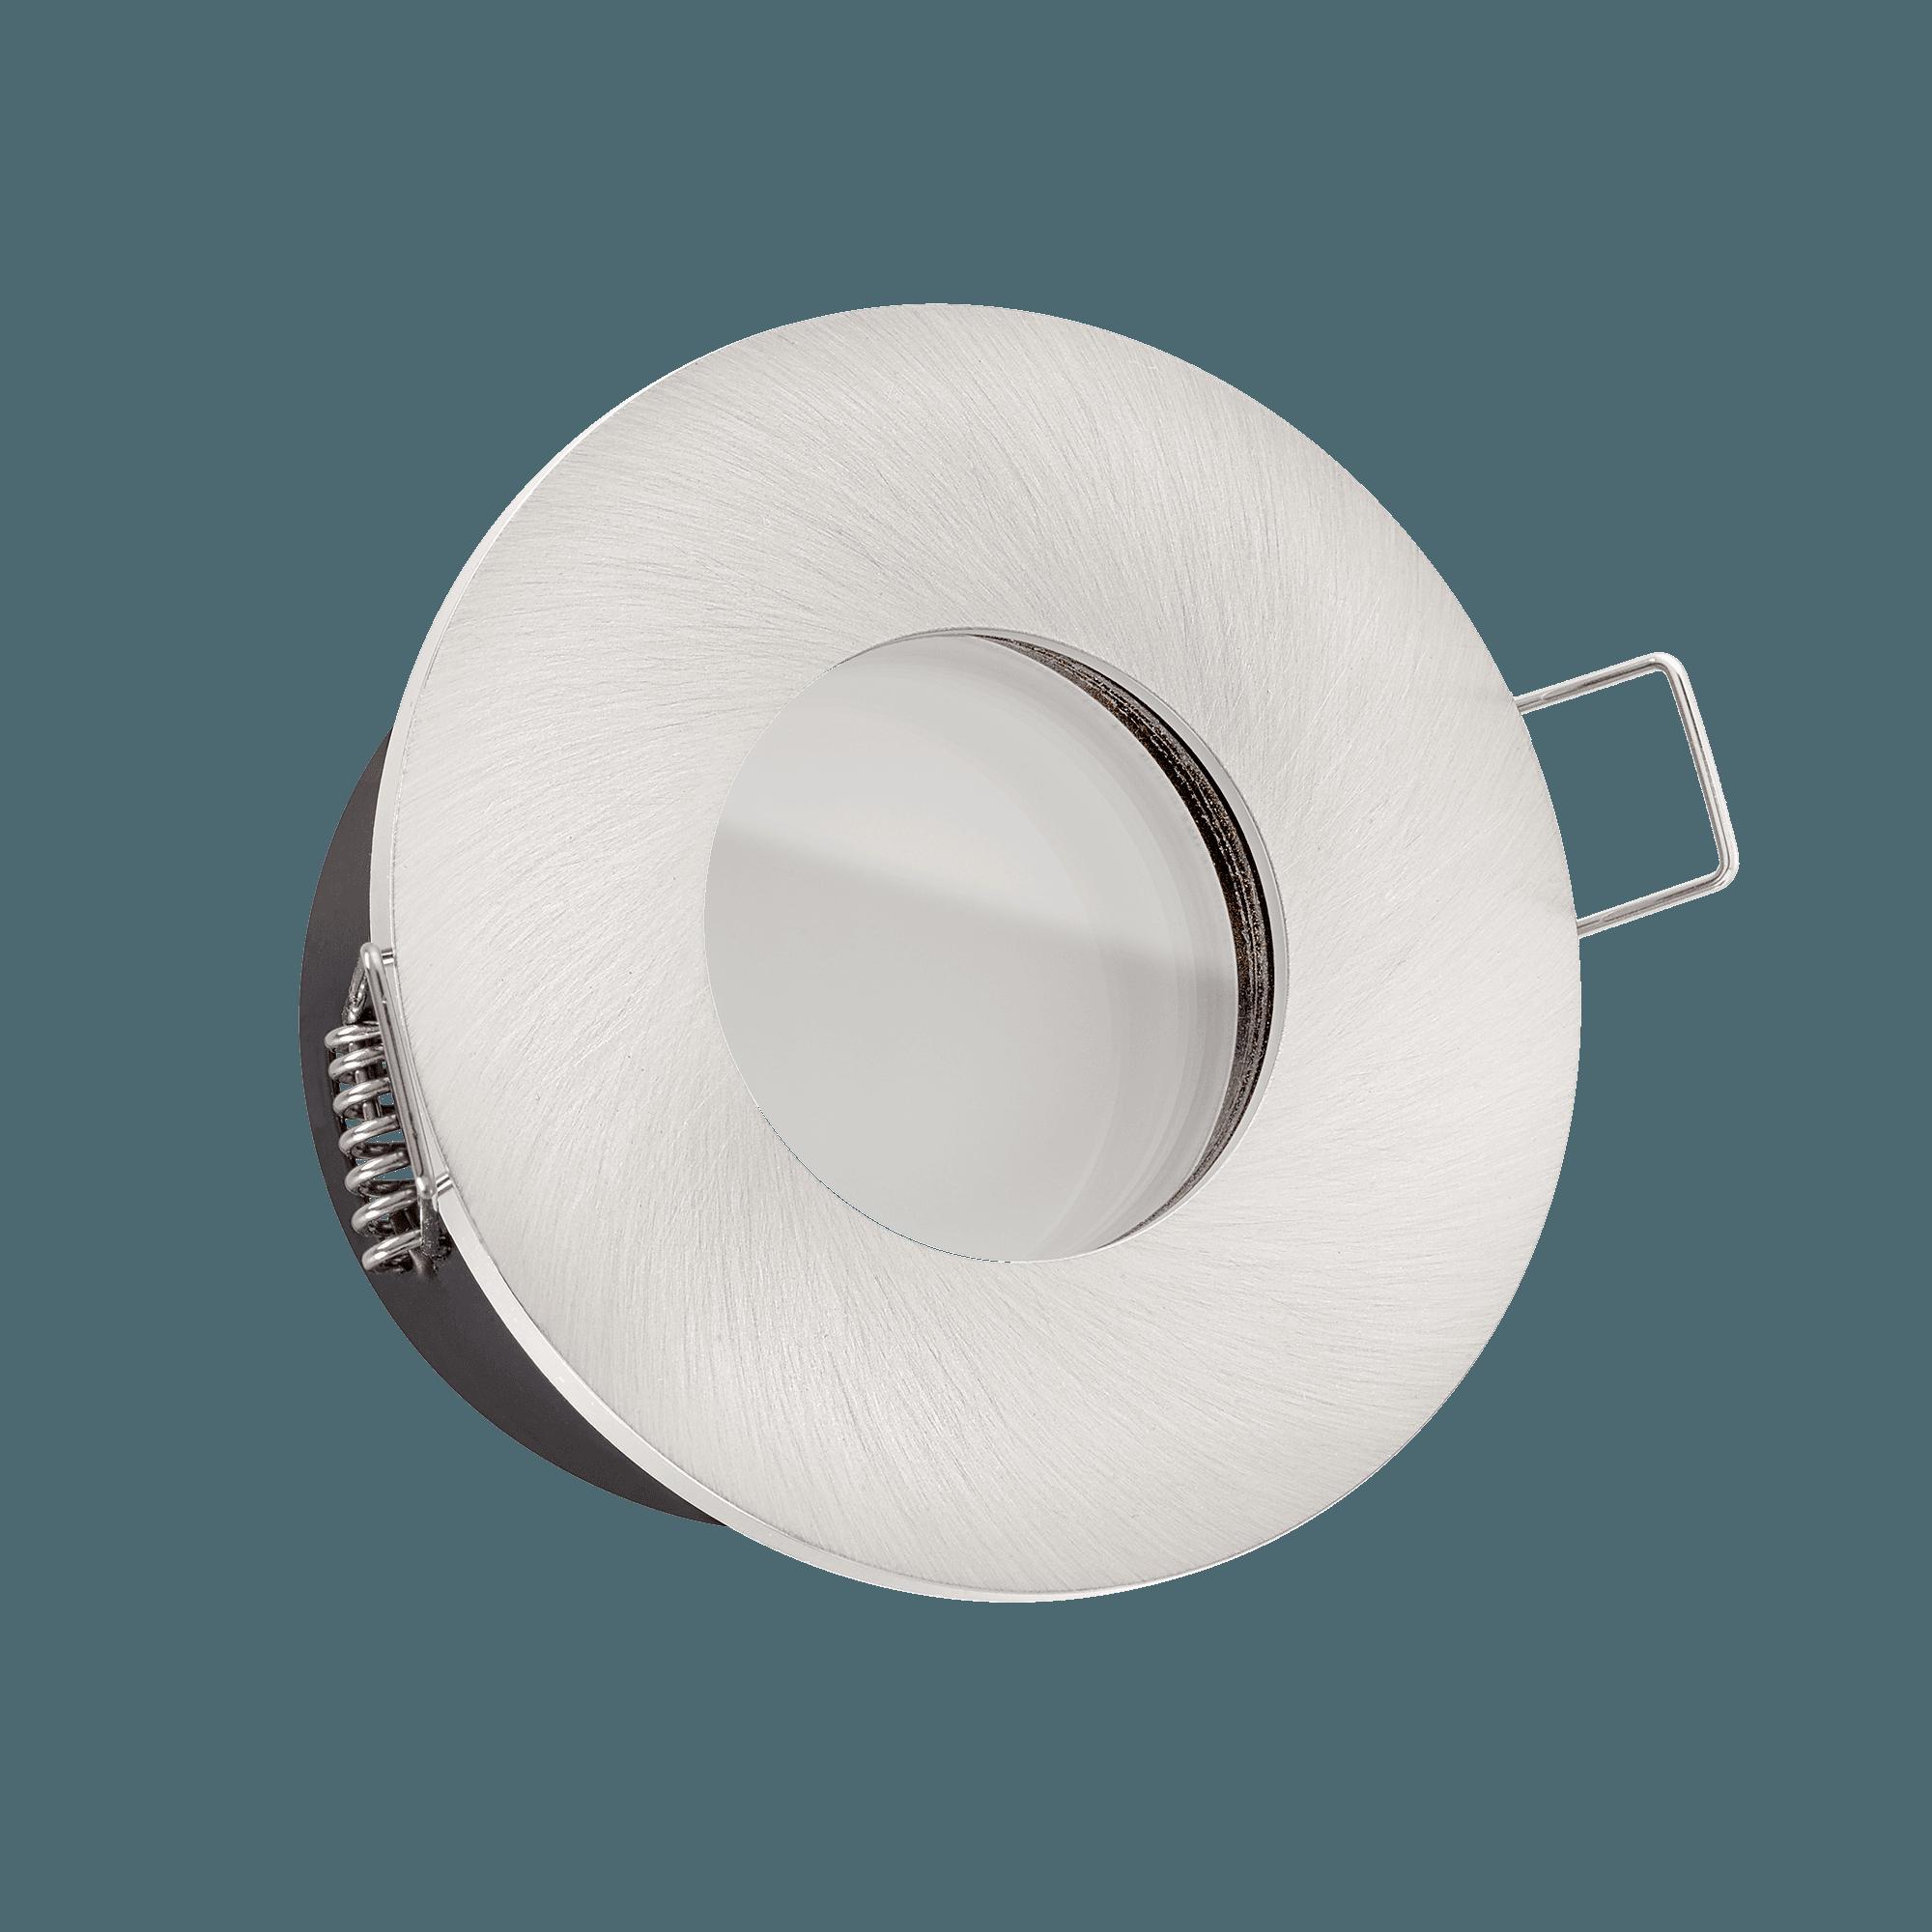 Knx Dali Kompatible Bad Led Einbaustrahler Extra Flach 25mm Dimmbar 6w Statt 70w Lista Aqua Eisen 120 Abstrahlung Aluminium Rund Ip65